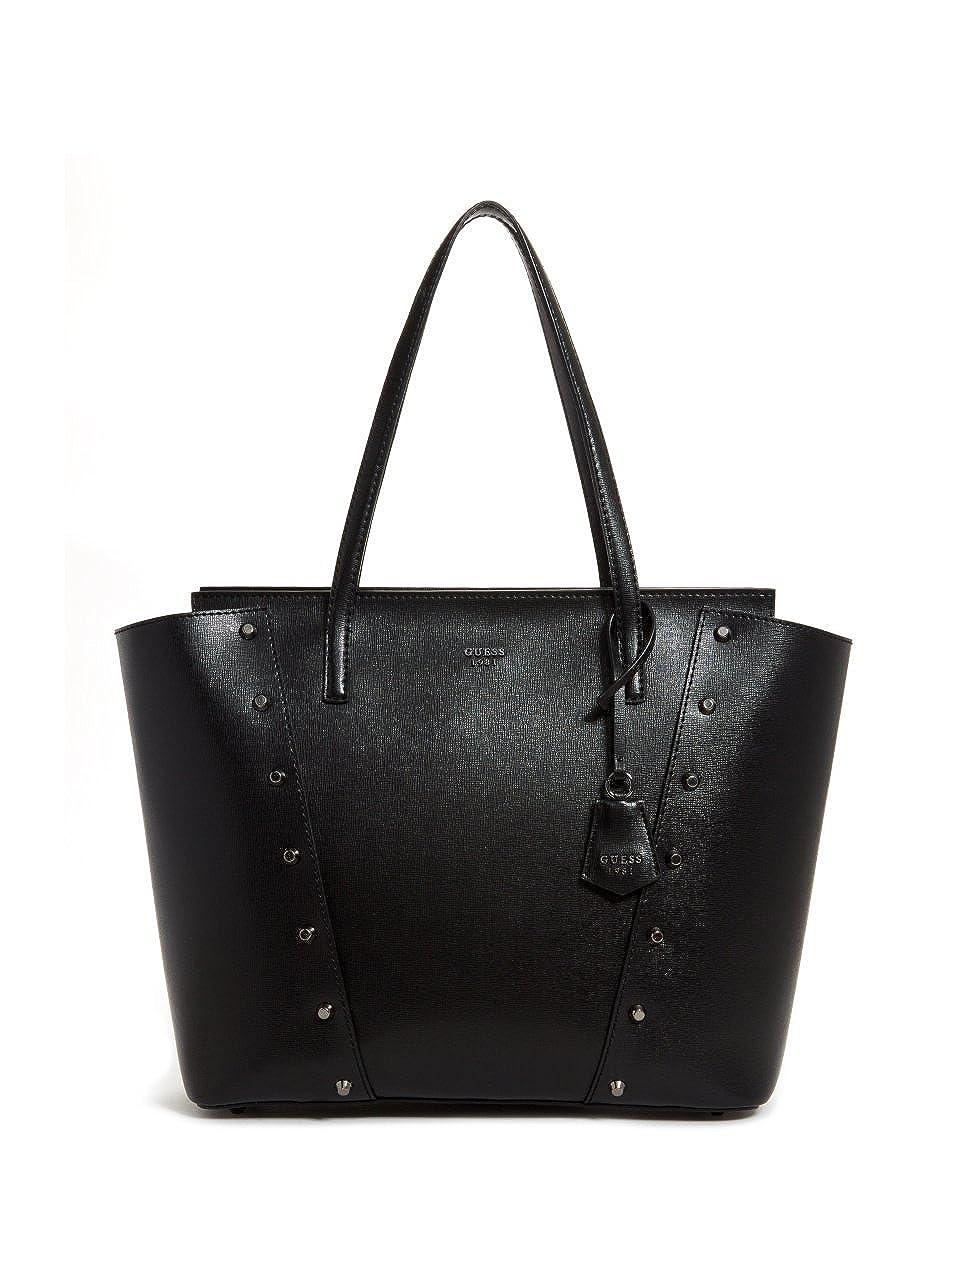 5d187741a9 Amazon.com  Guess Kaia Ladies Large PU Leather Tote Handbag VM685923BLA   Watches